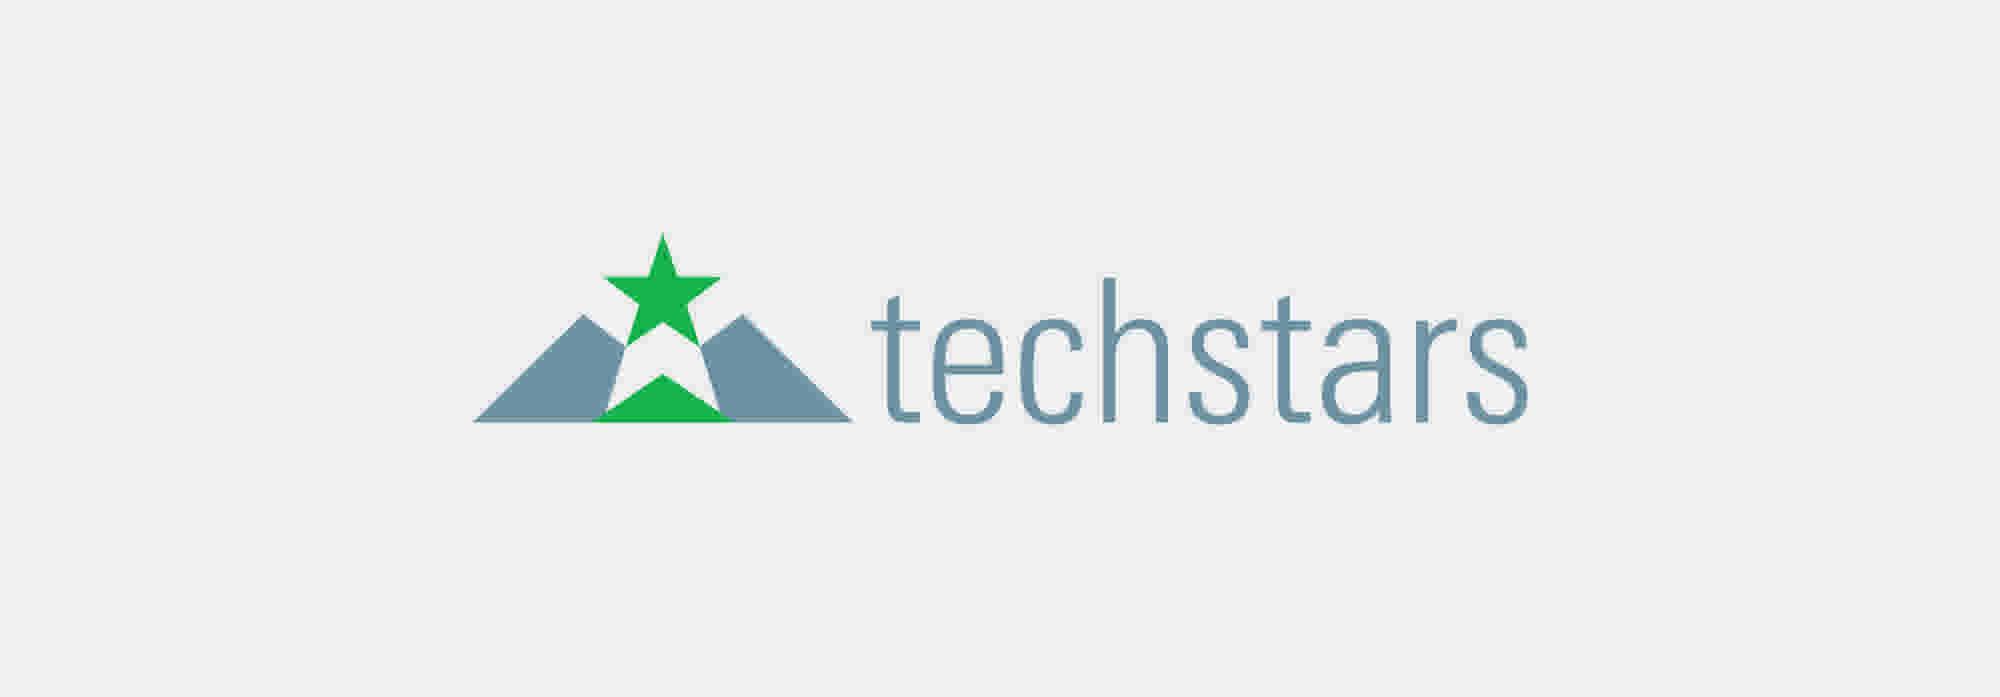 Forestry.io + Techstars 2016